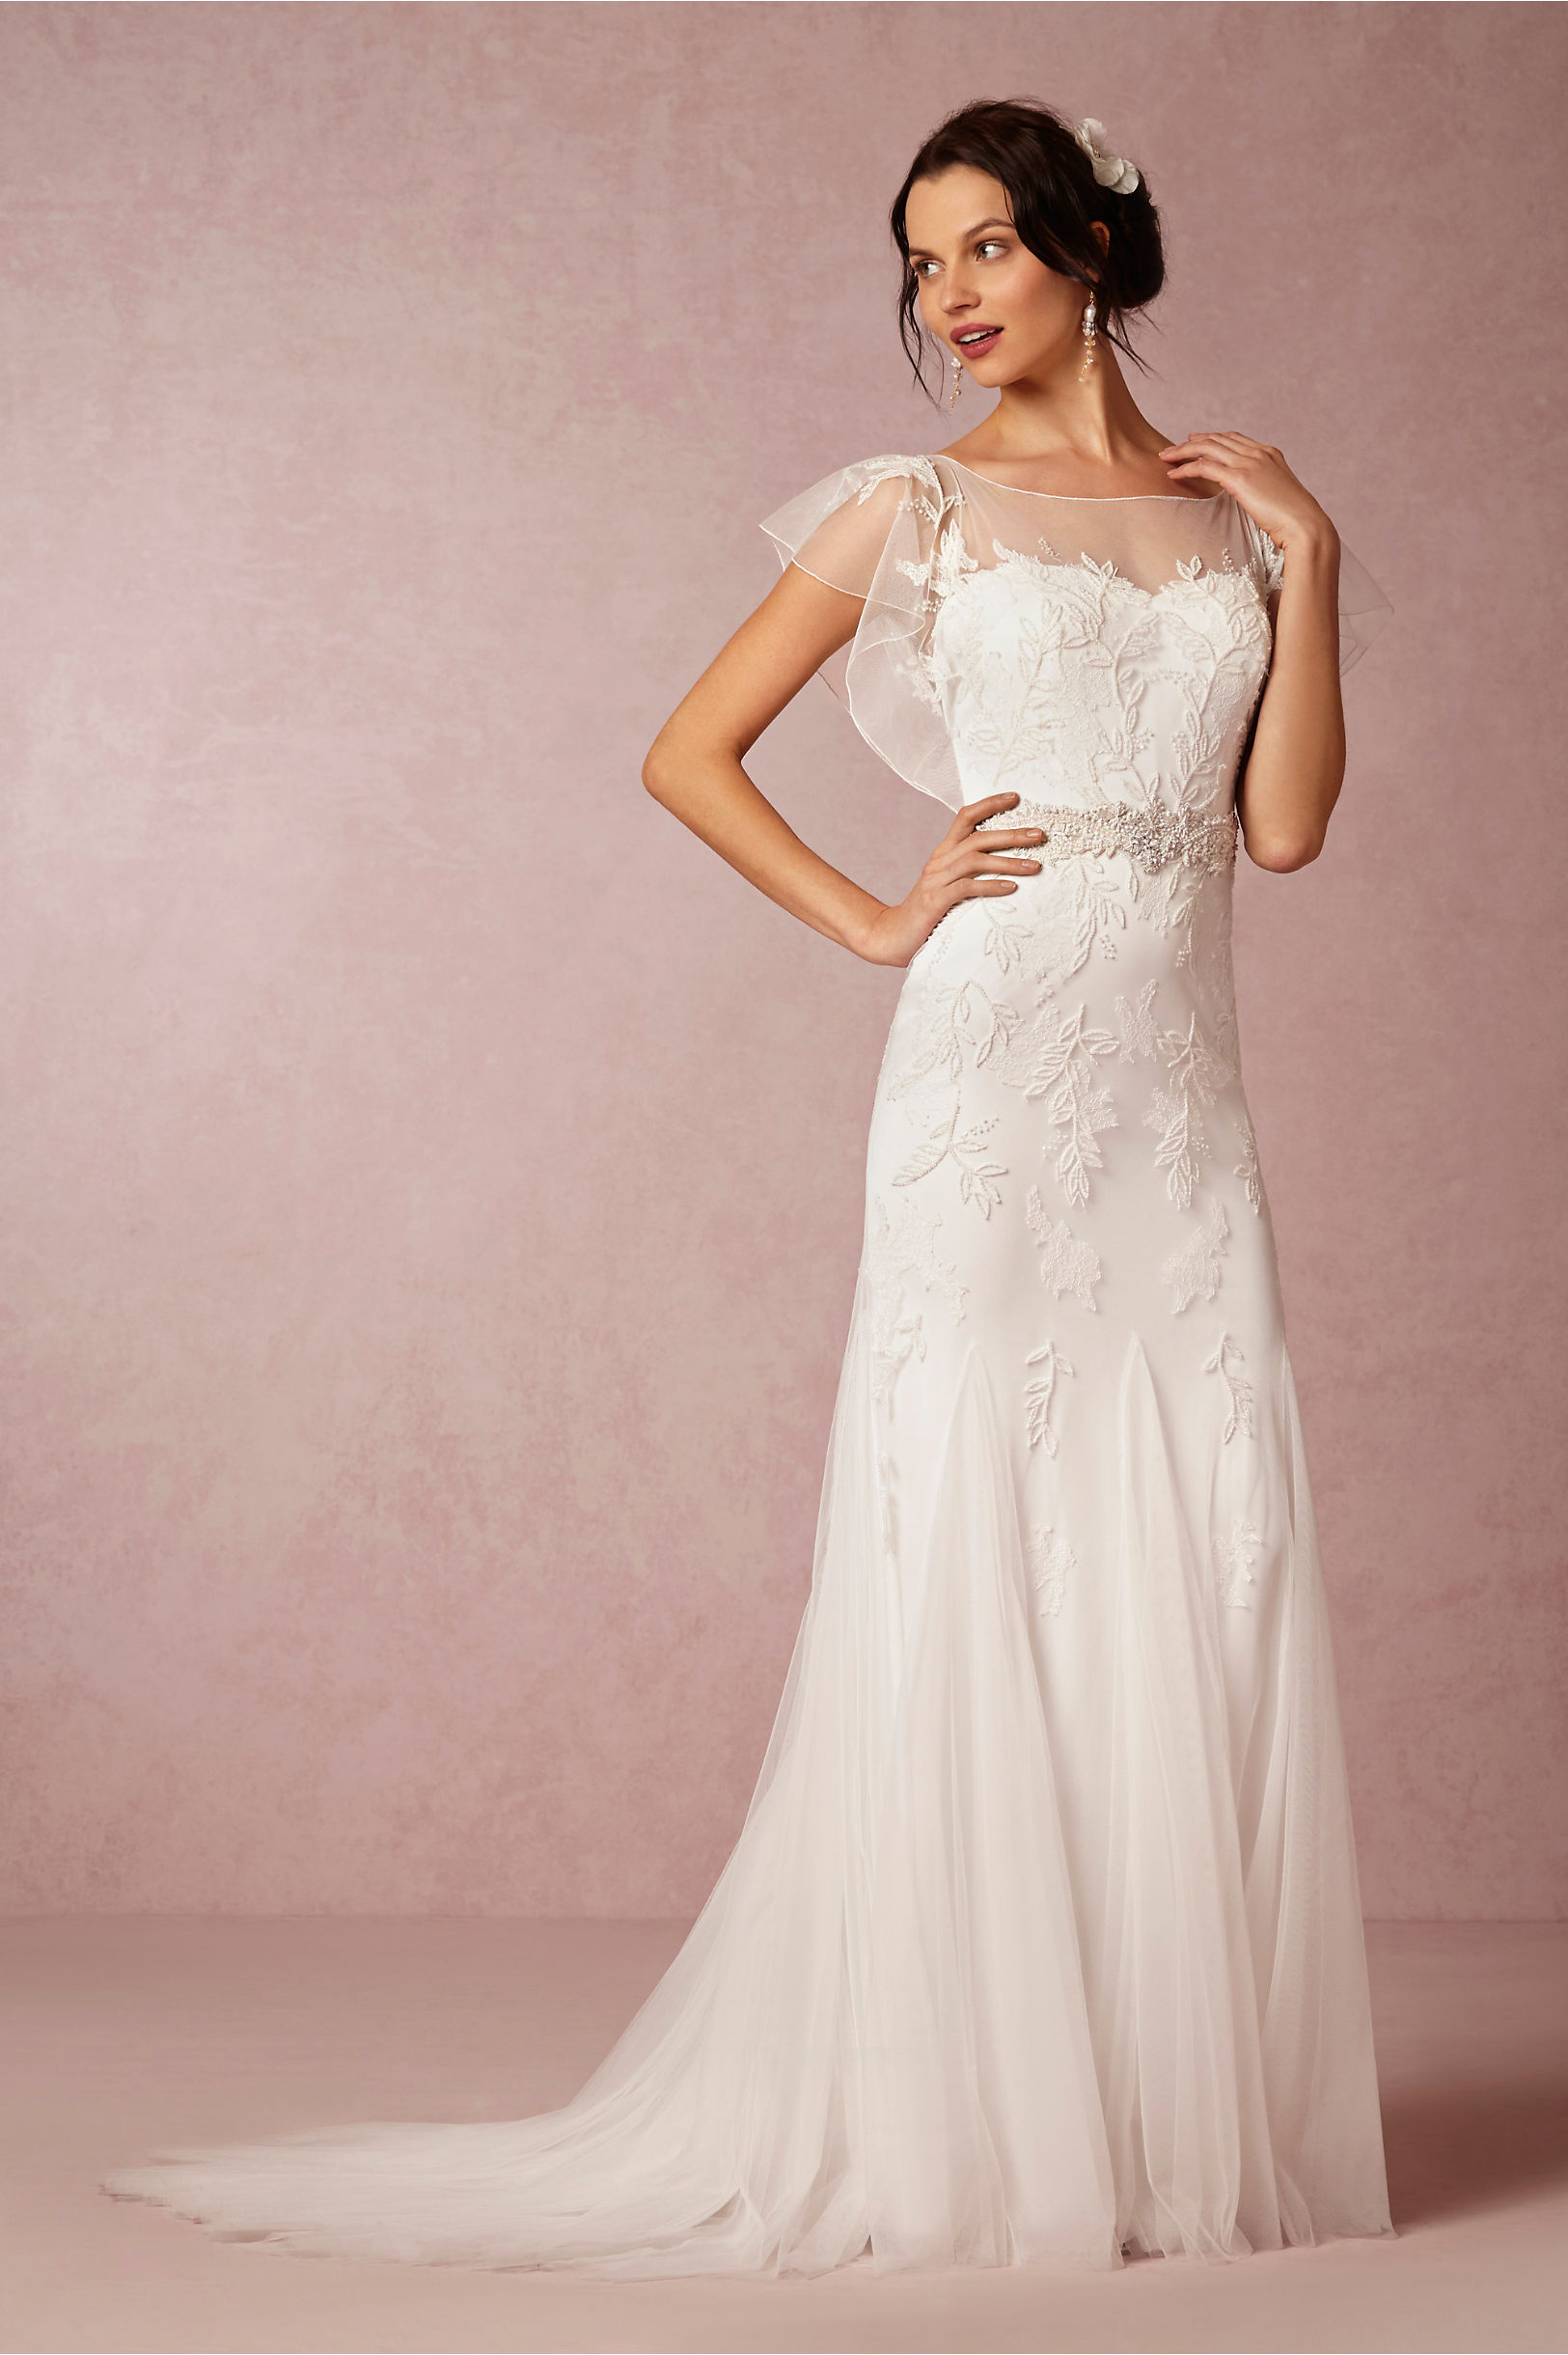 A Soft Luxury Wedding Dress For Slim Women